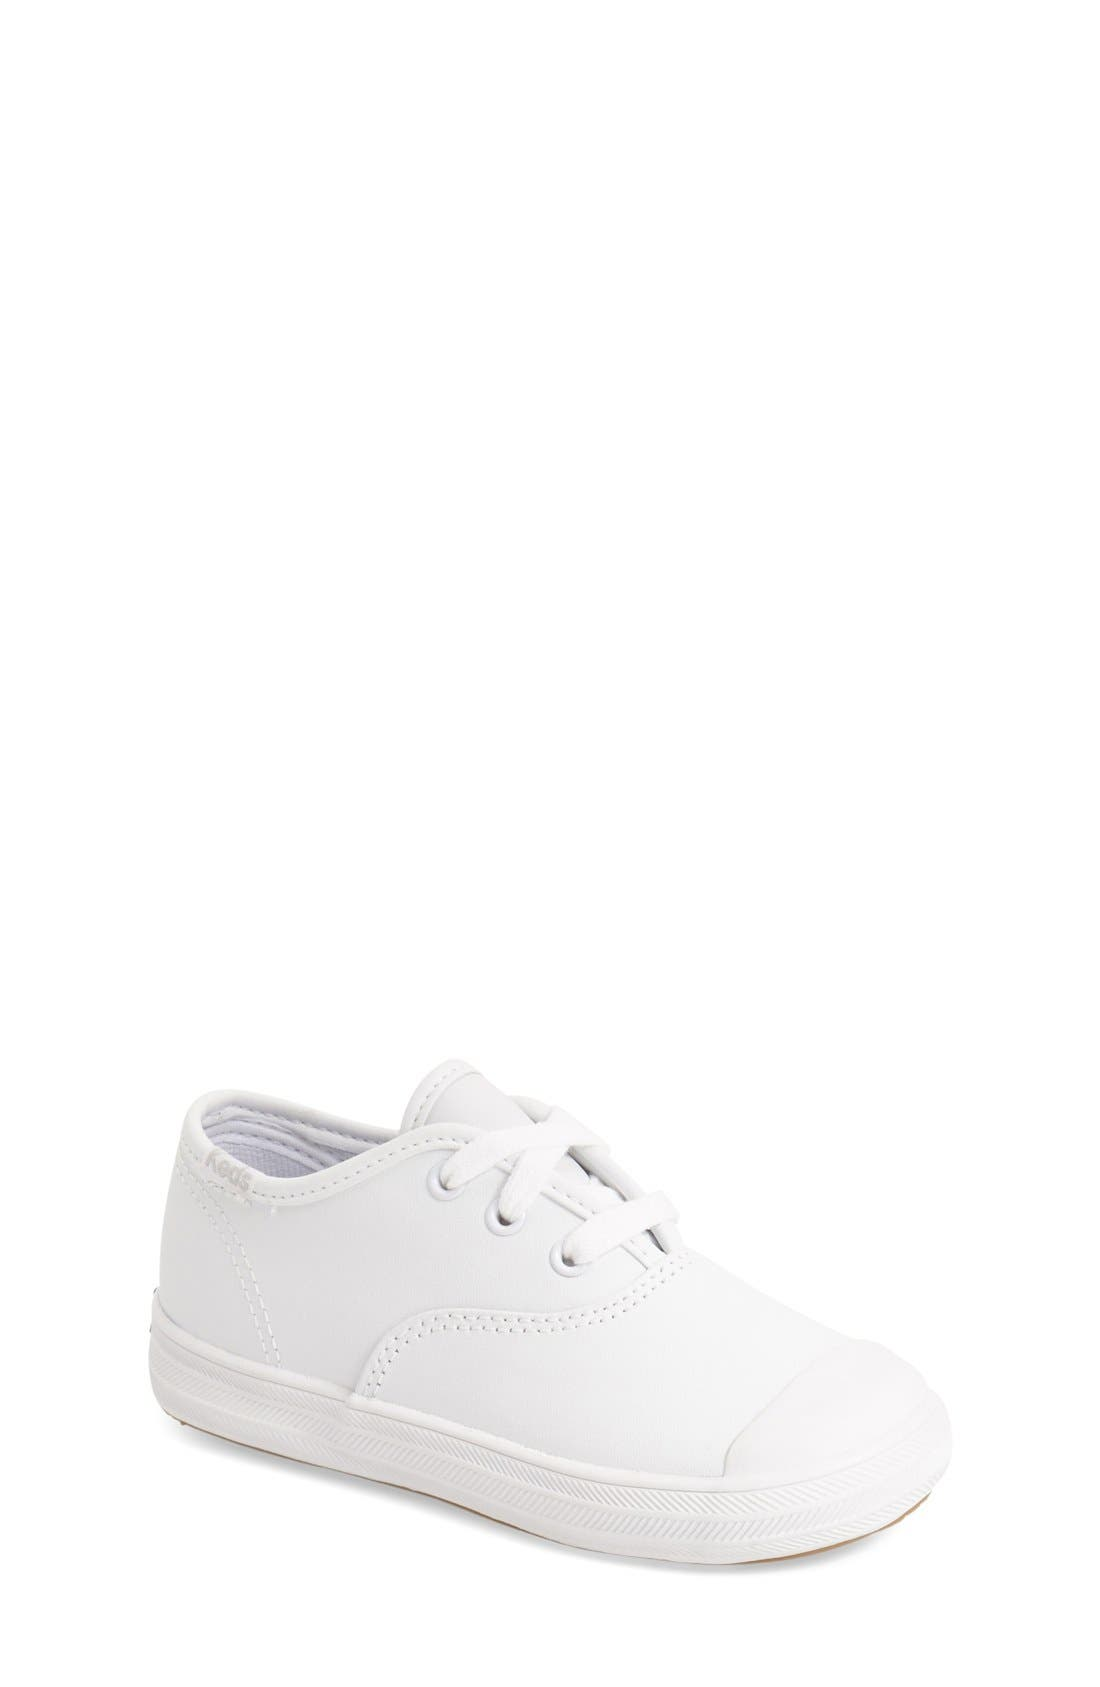 'Champion' Sneaker,                         Main,                         color, WHITE LEATHER